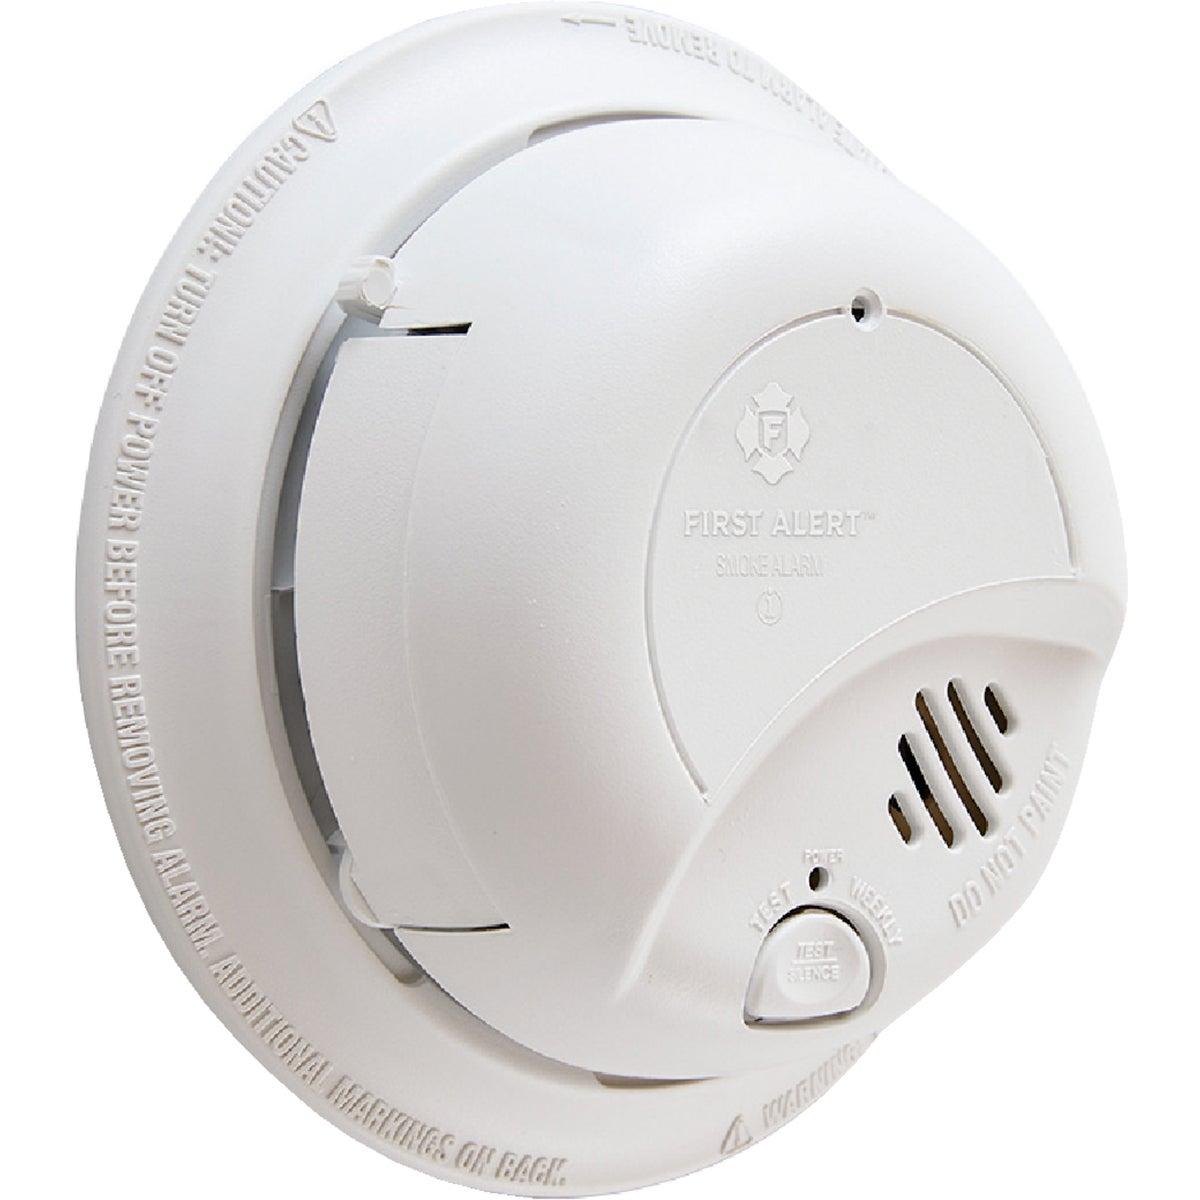 first alert smoke and carbon monoxide alarm manual sc9120b